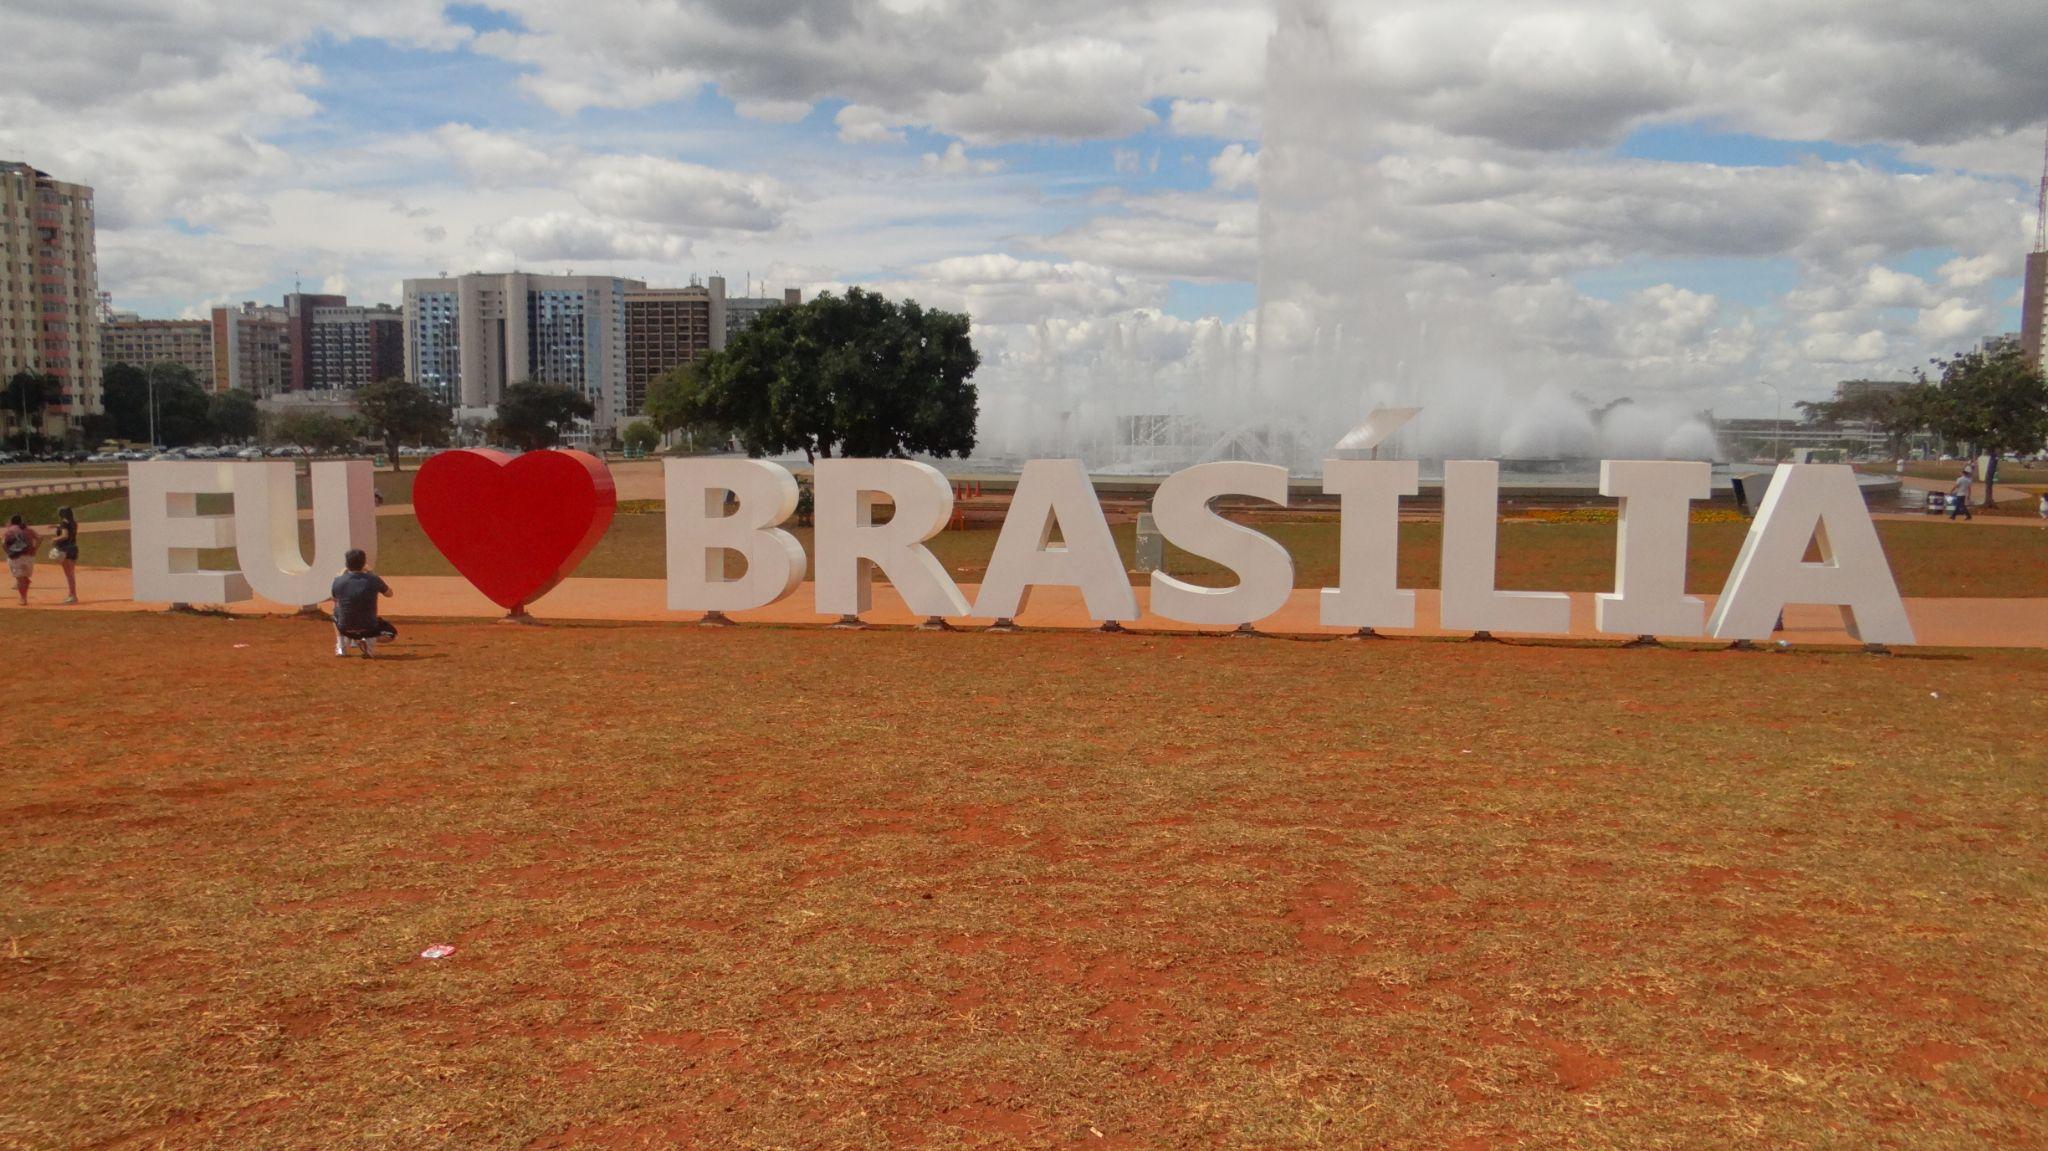 Brasília-Brazil by kbcao.pedro